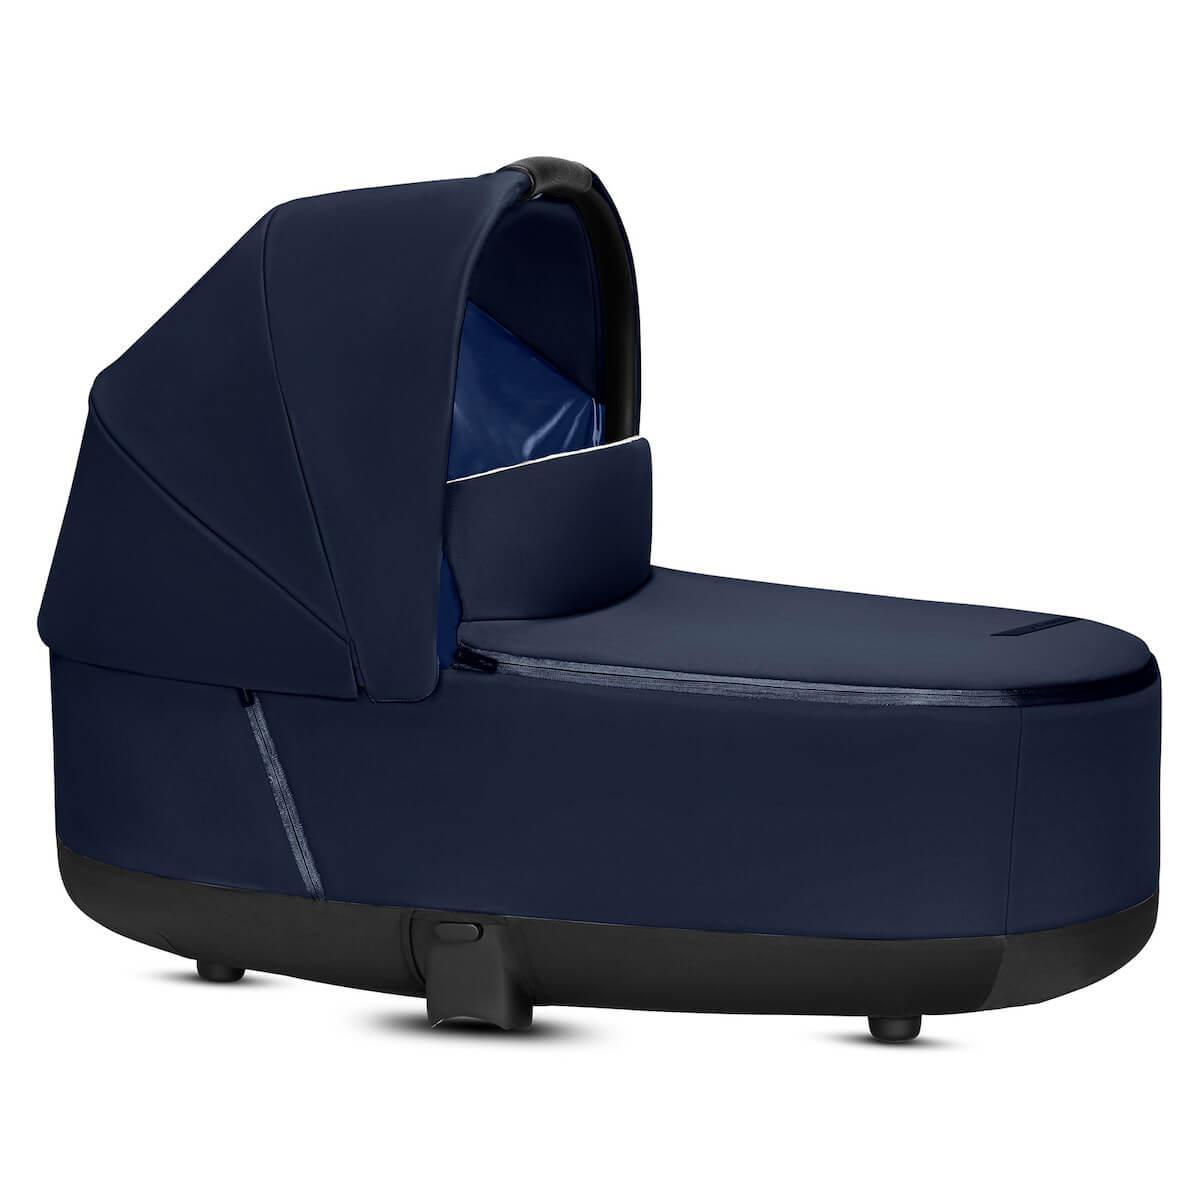 Capazo de luxe PRIAM Cybex indigo blue-navy blue